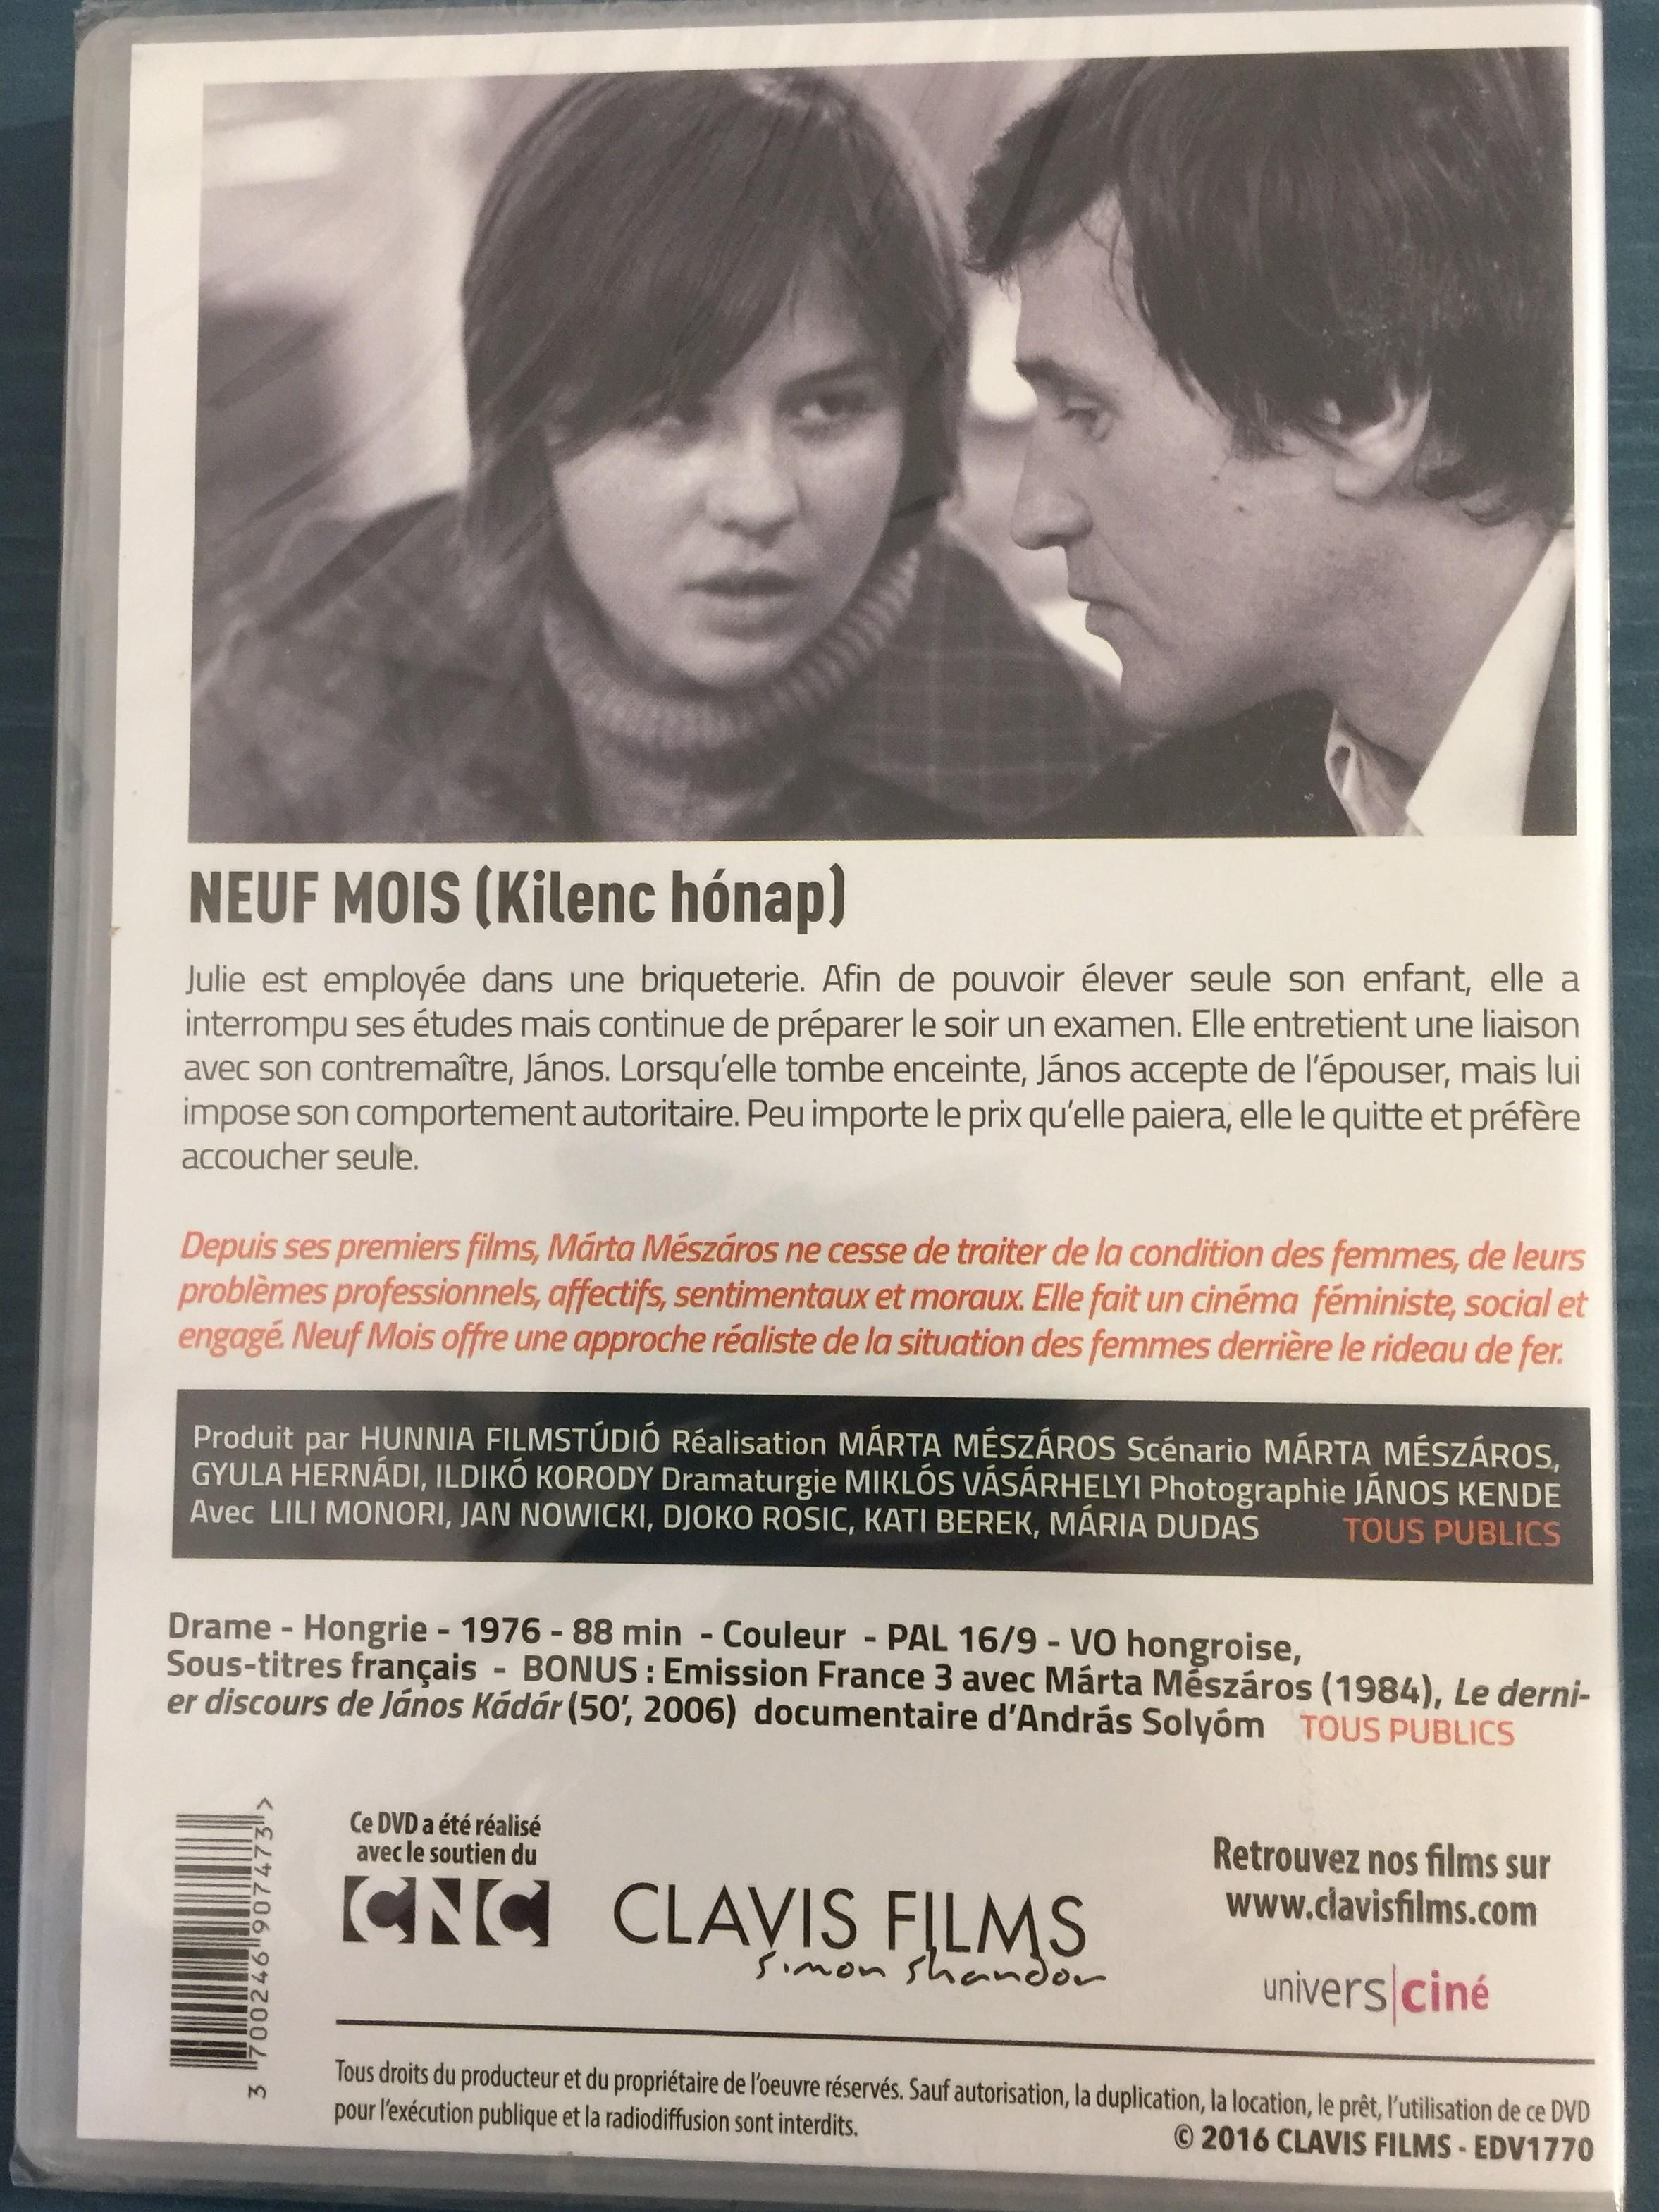 neuf-mois-nine-months-dvd-1976-kilenc-h-nap-2.jpg